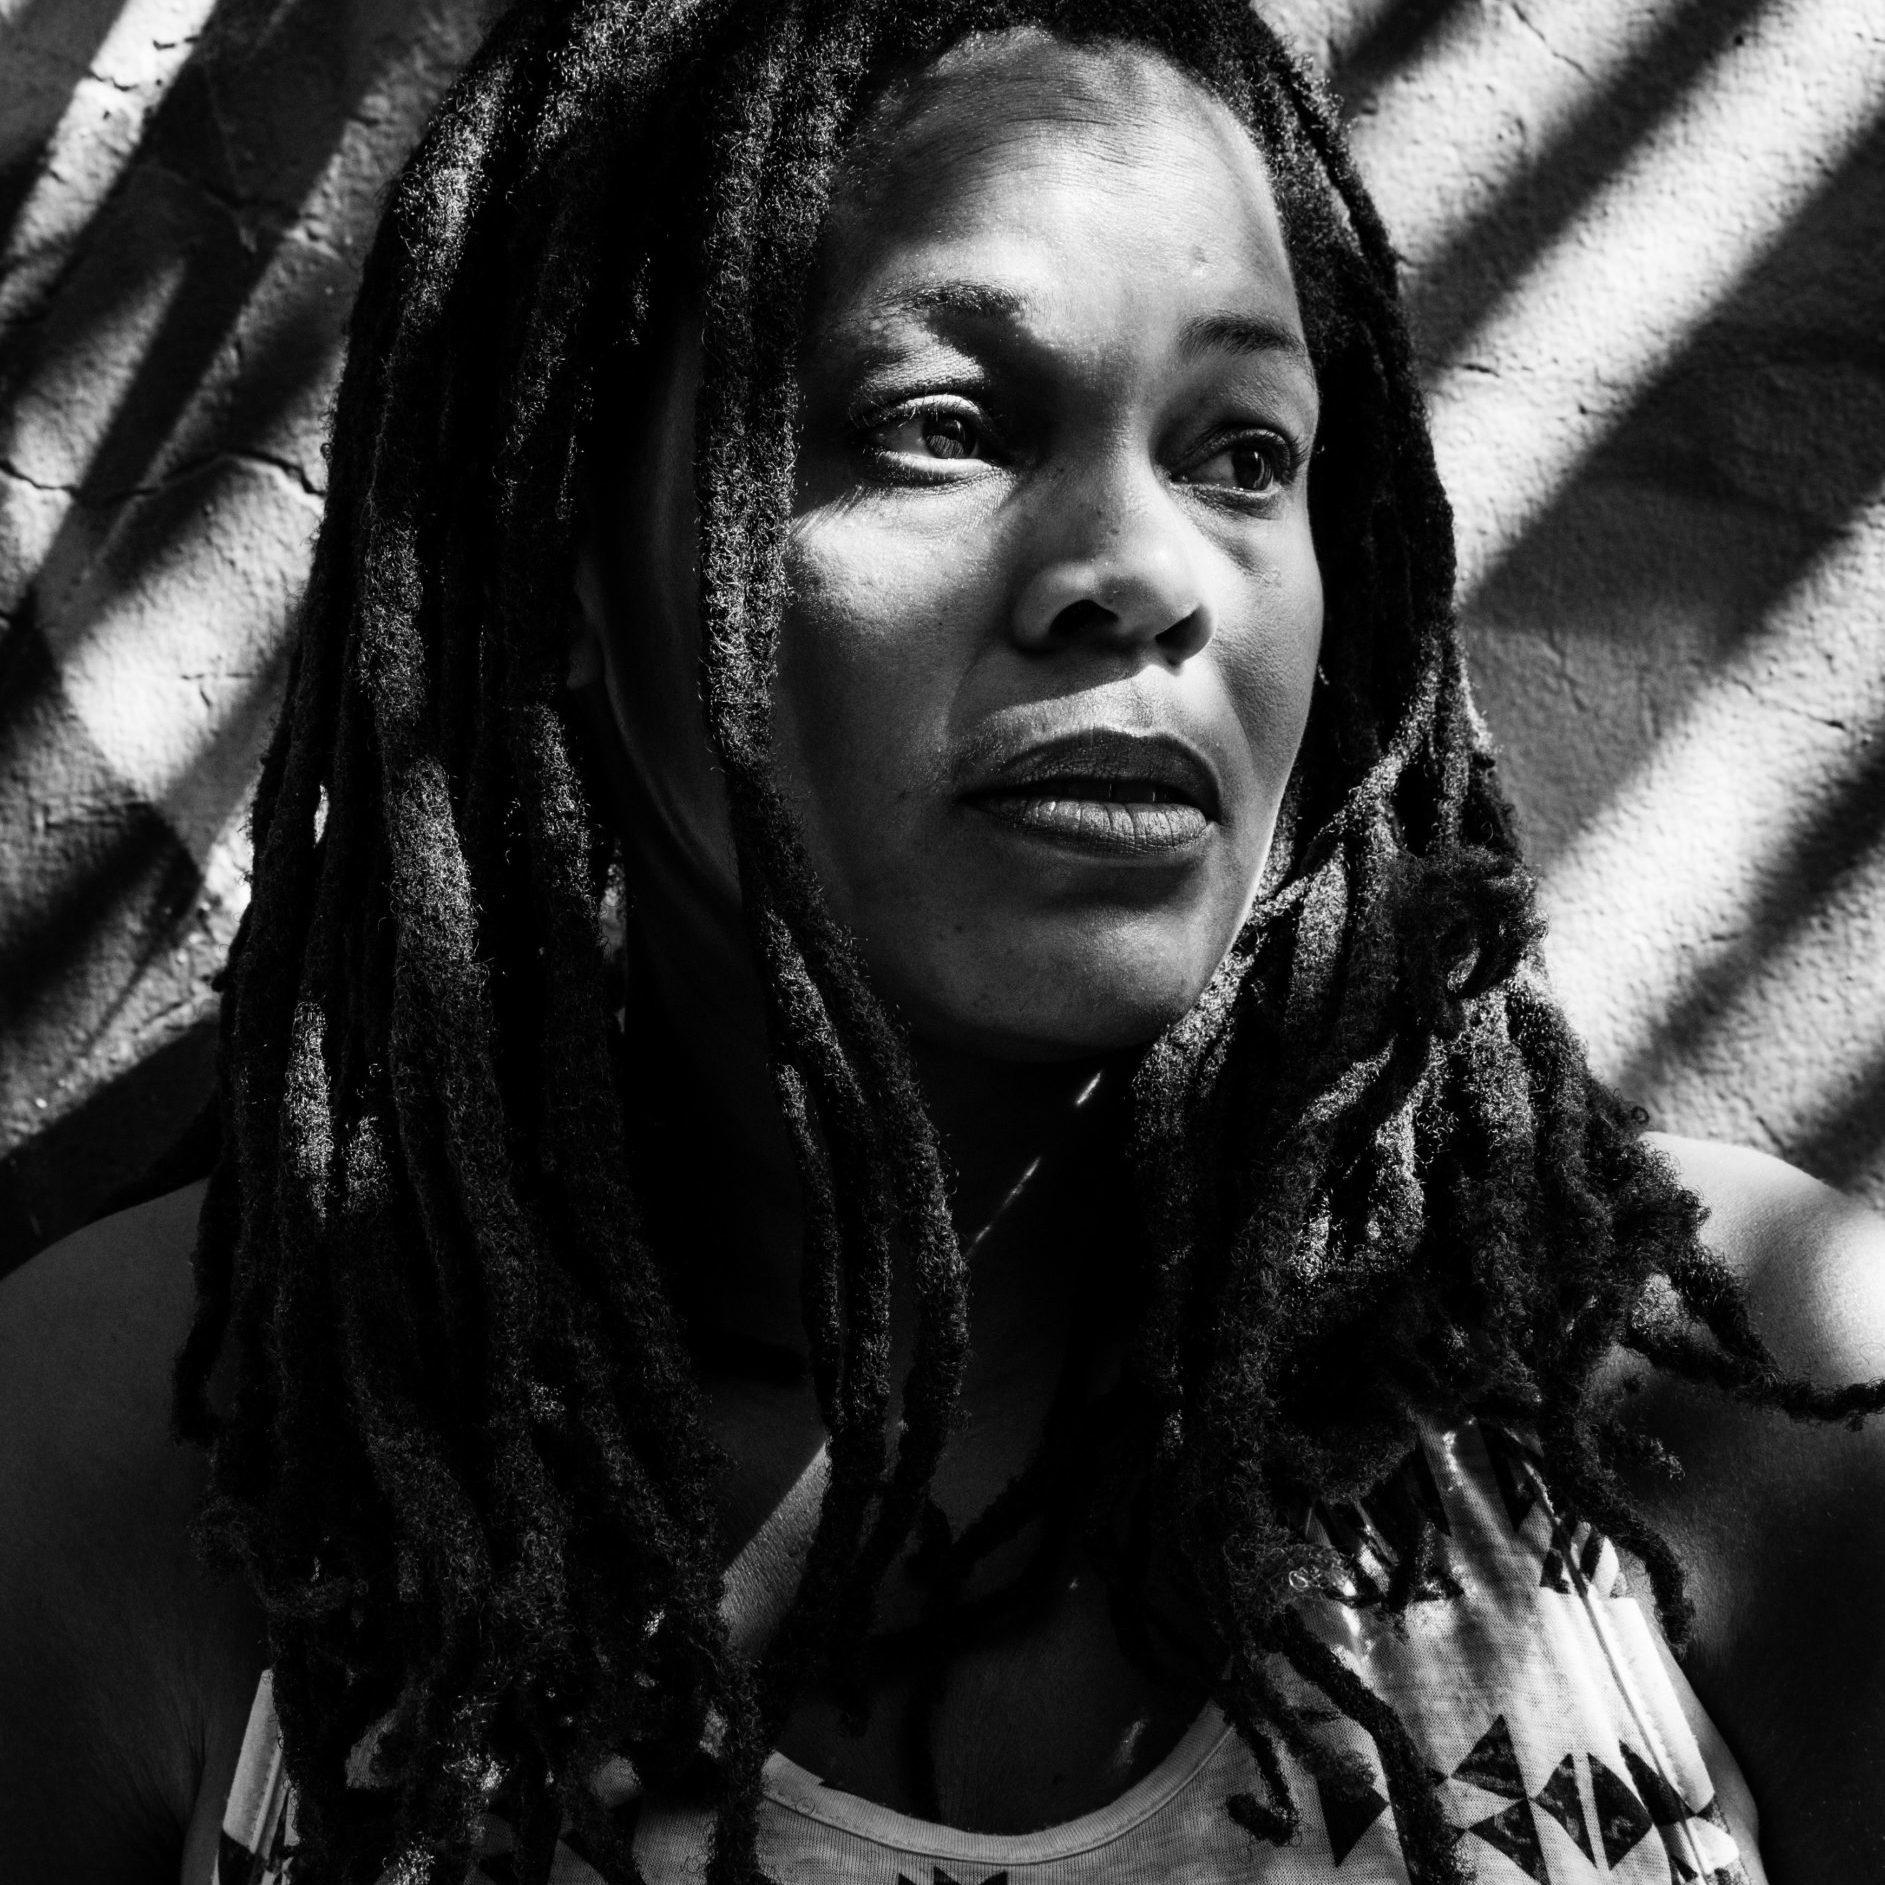 Cherie Hill She-Verse headshot photo by Robbie Sweeny